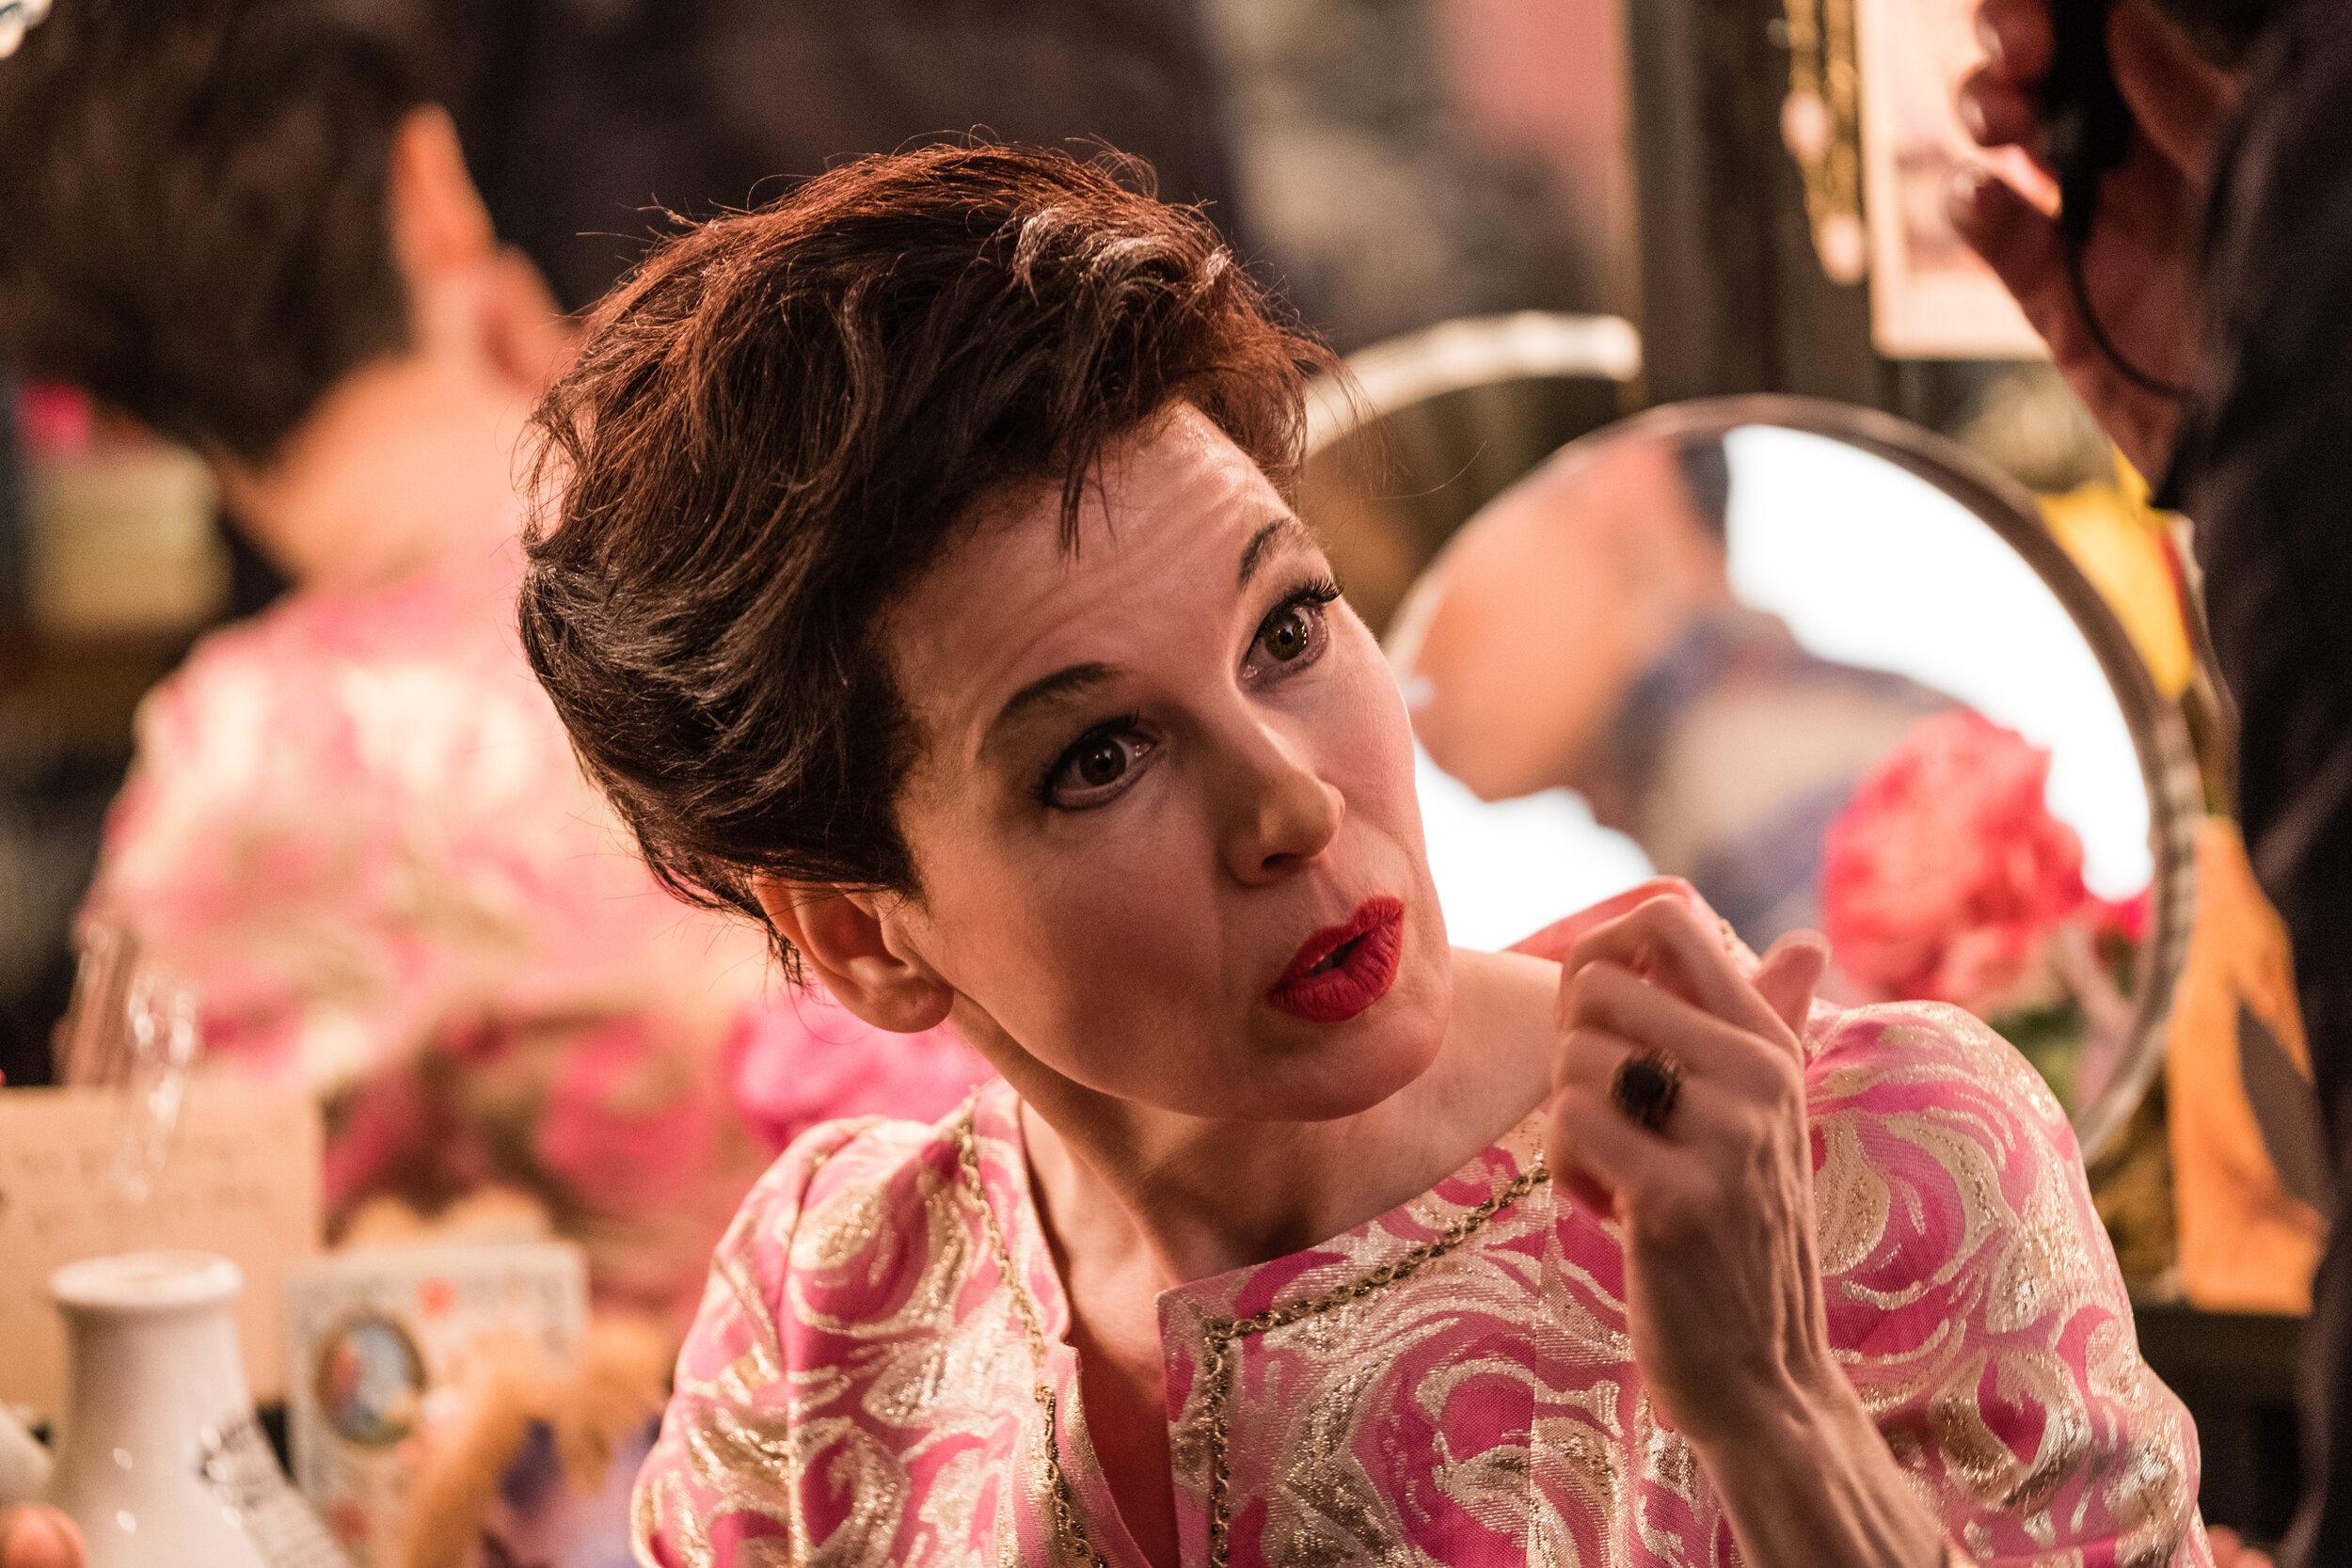 Renée Zellweger as Judy Garland in JUDY. Photo Credit: David Hindley